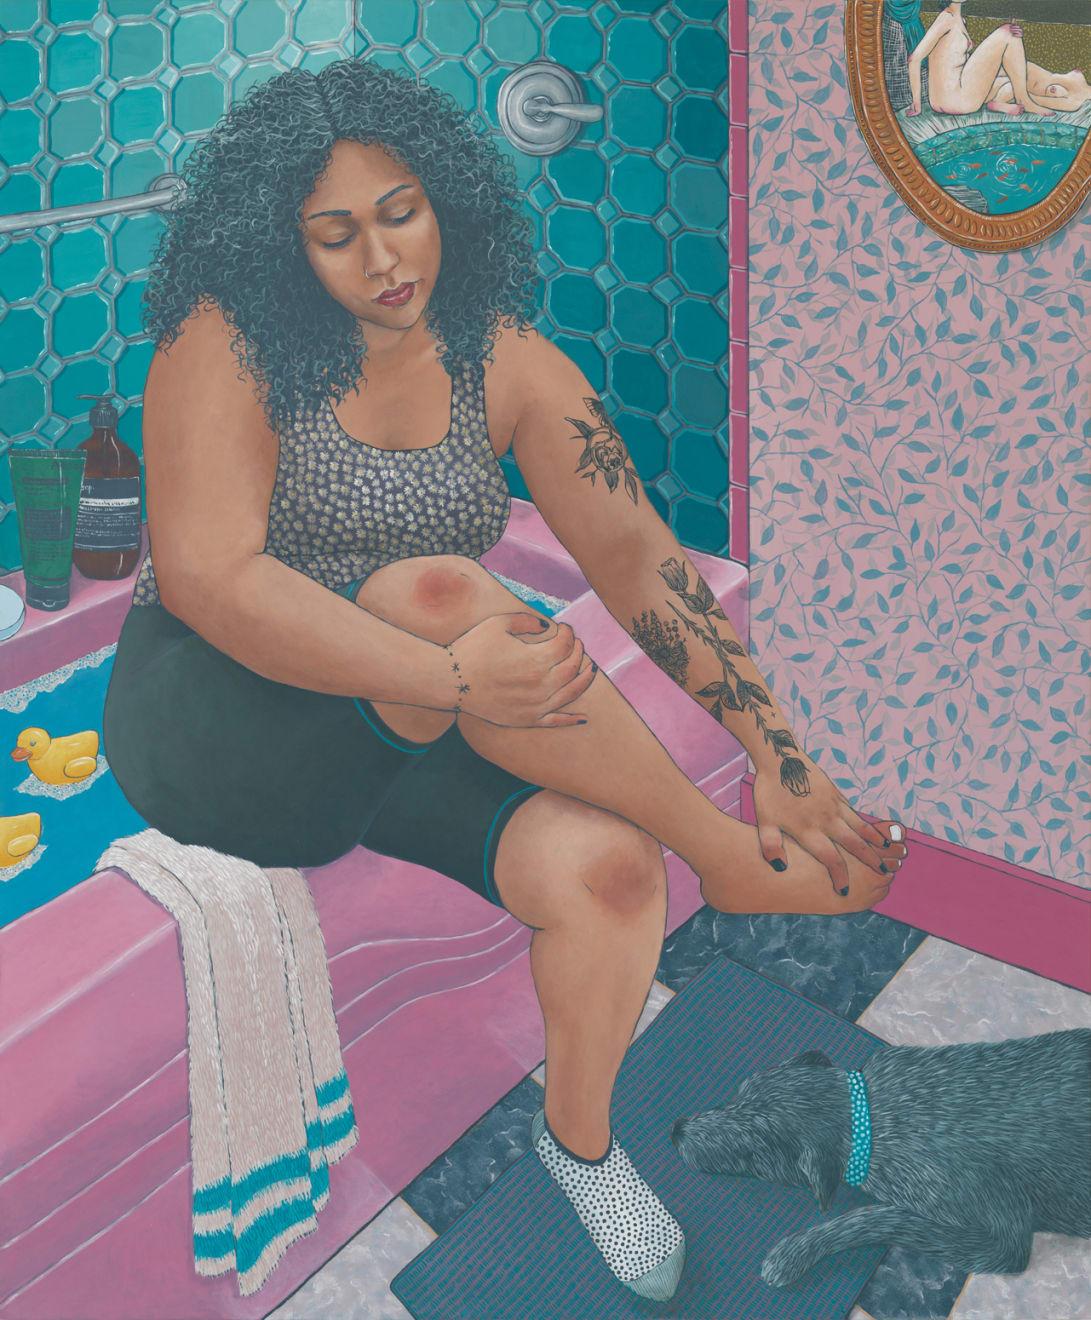 Shona McAndrew, Cheyenne, 2019 | CHART